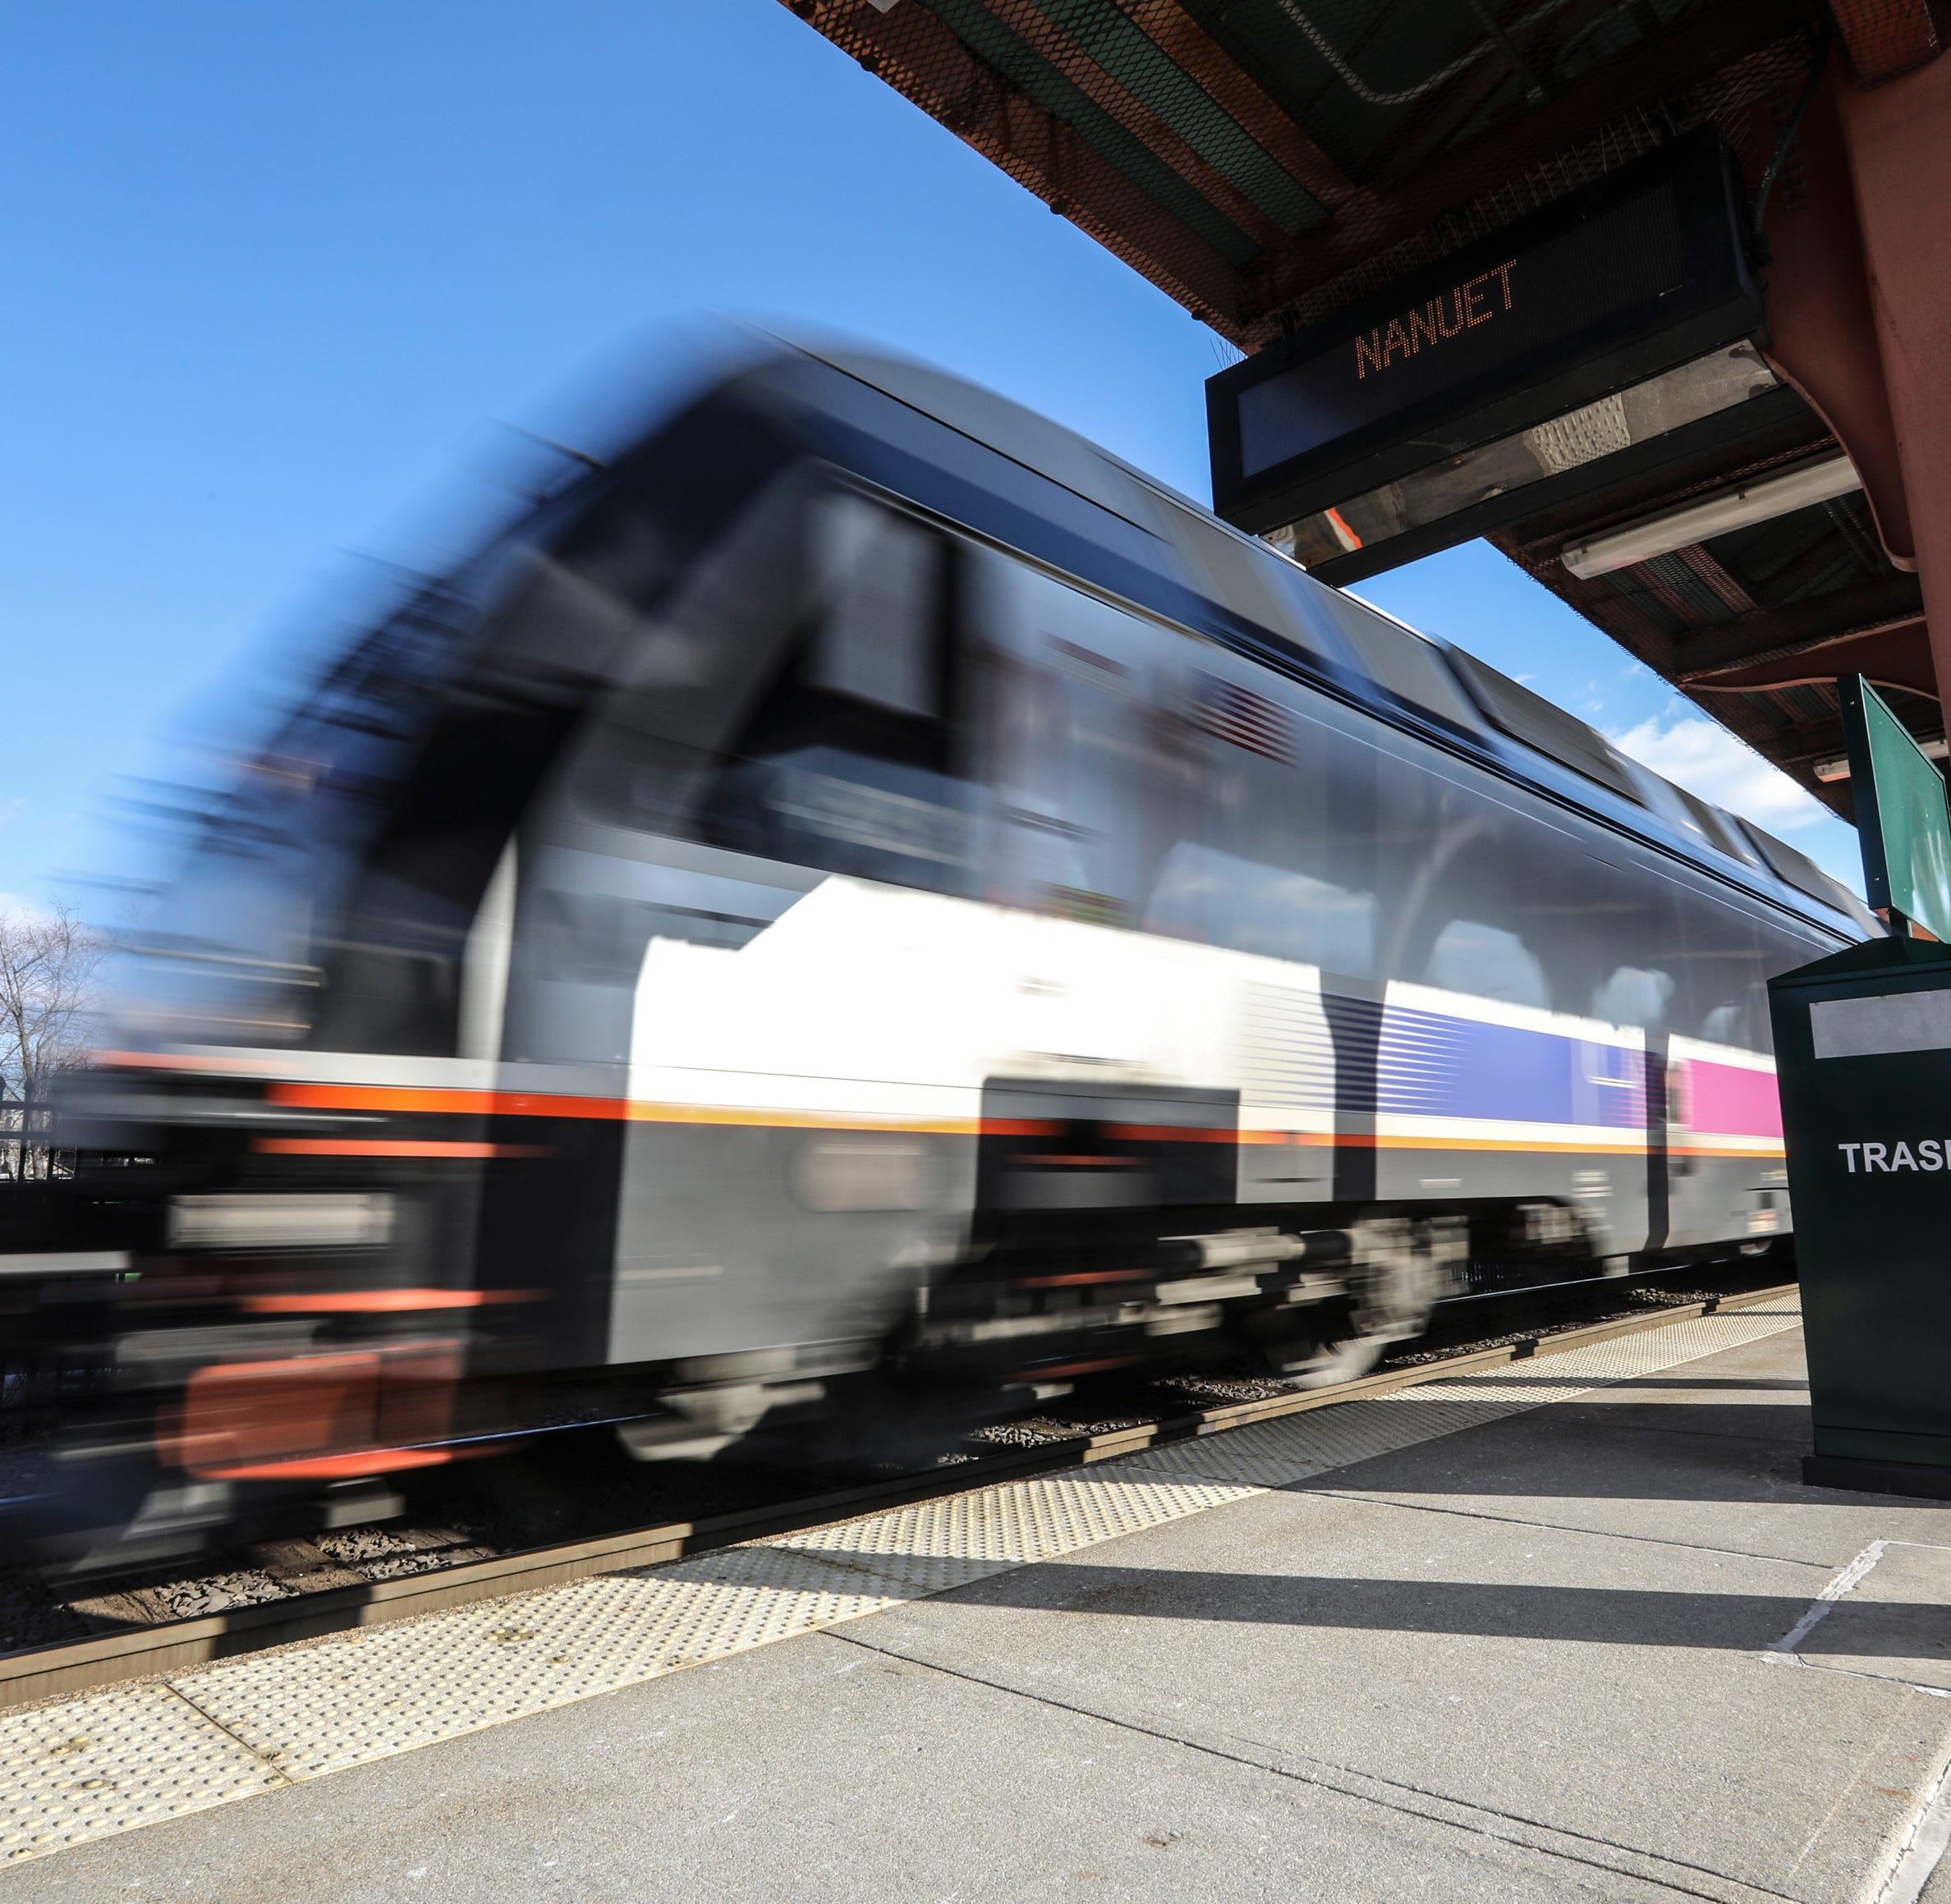 Commuter rail advocate: West-of-Hudson riders deserve reliable service